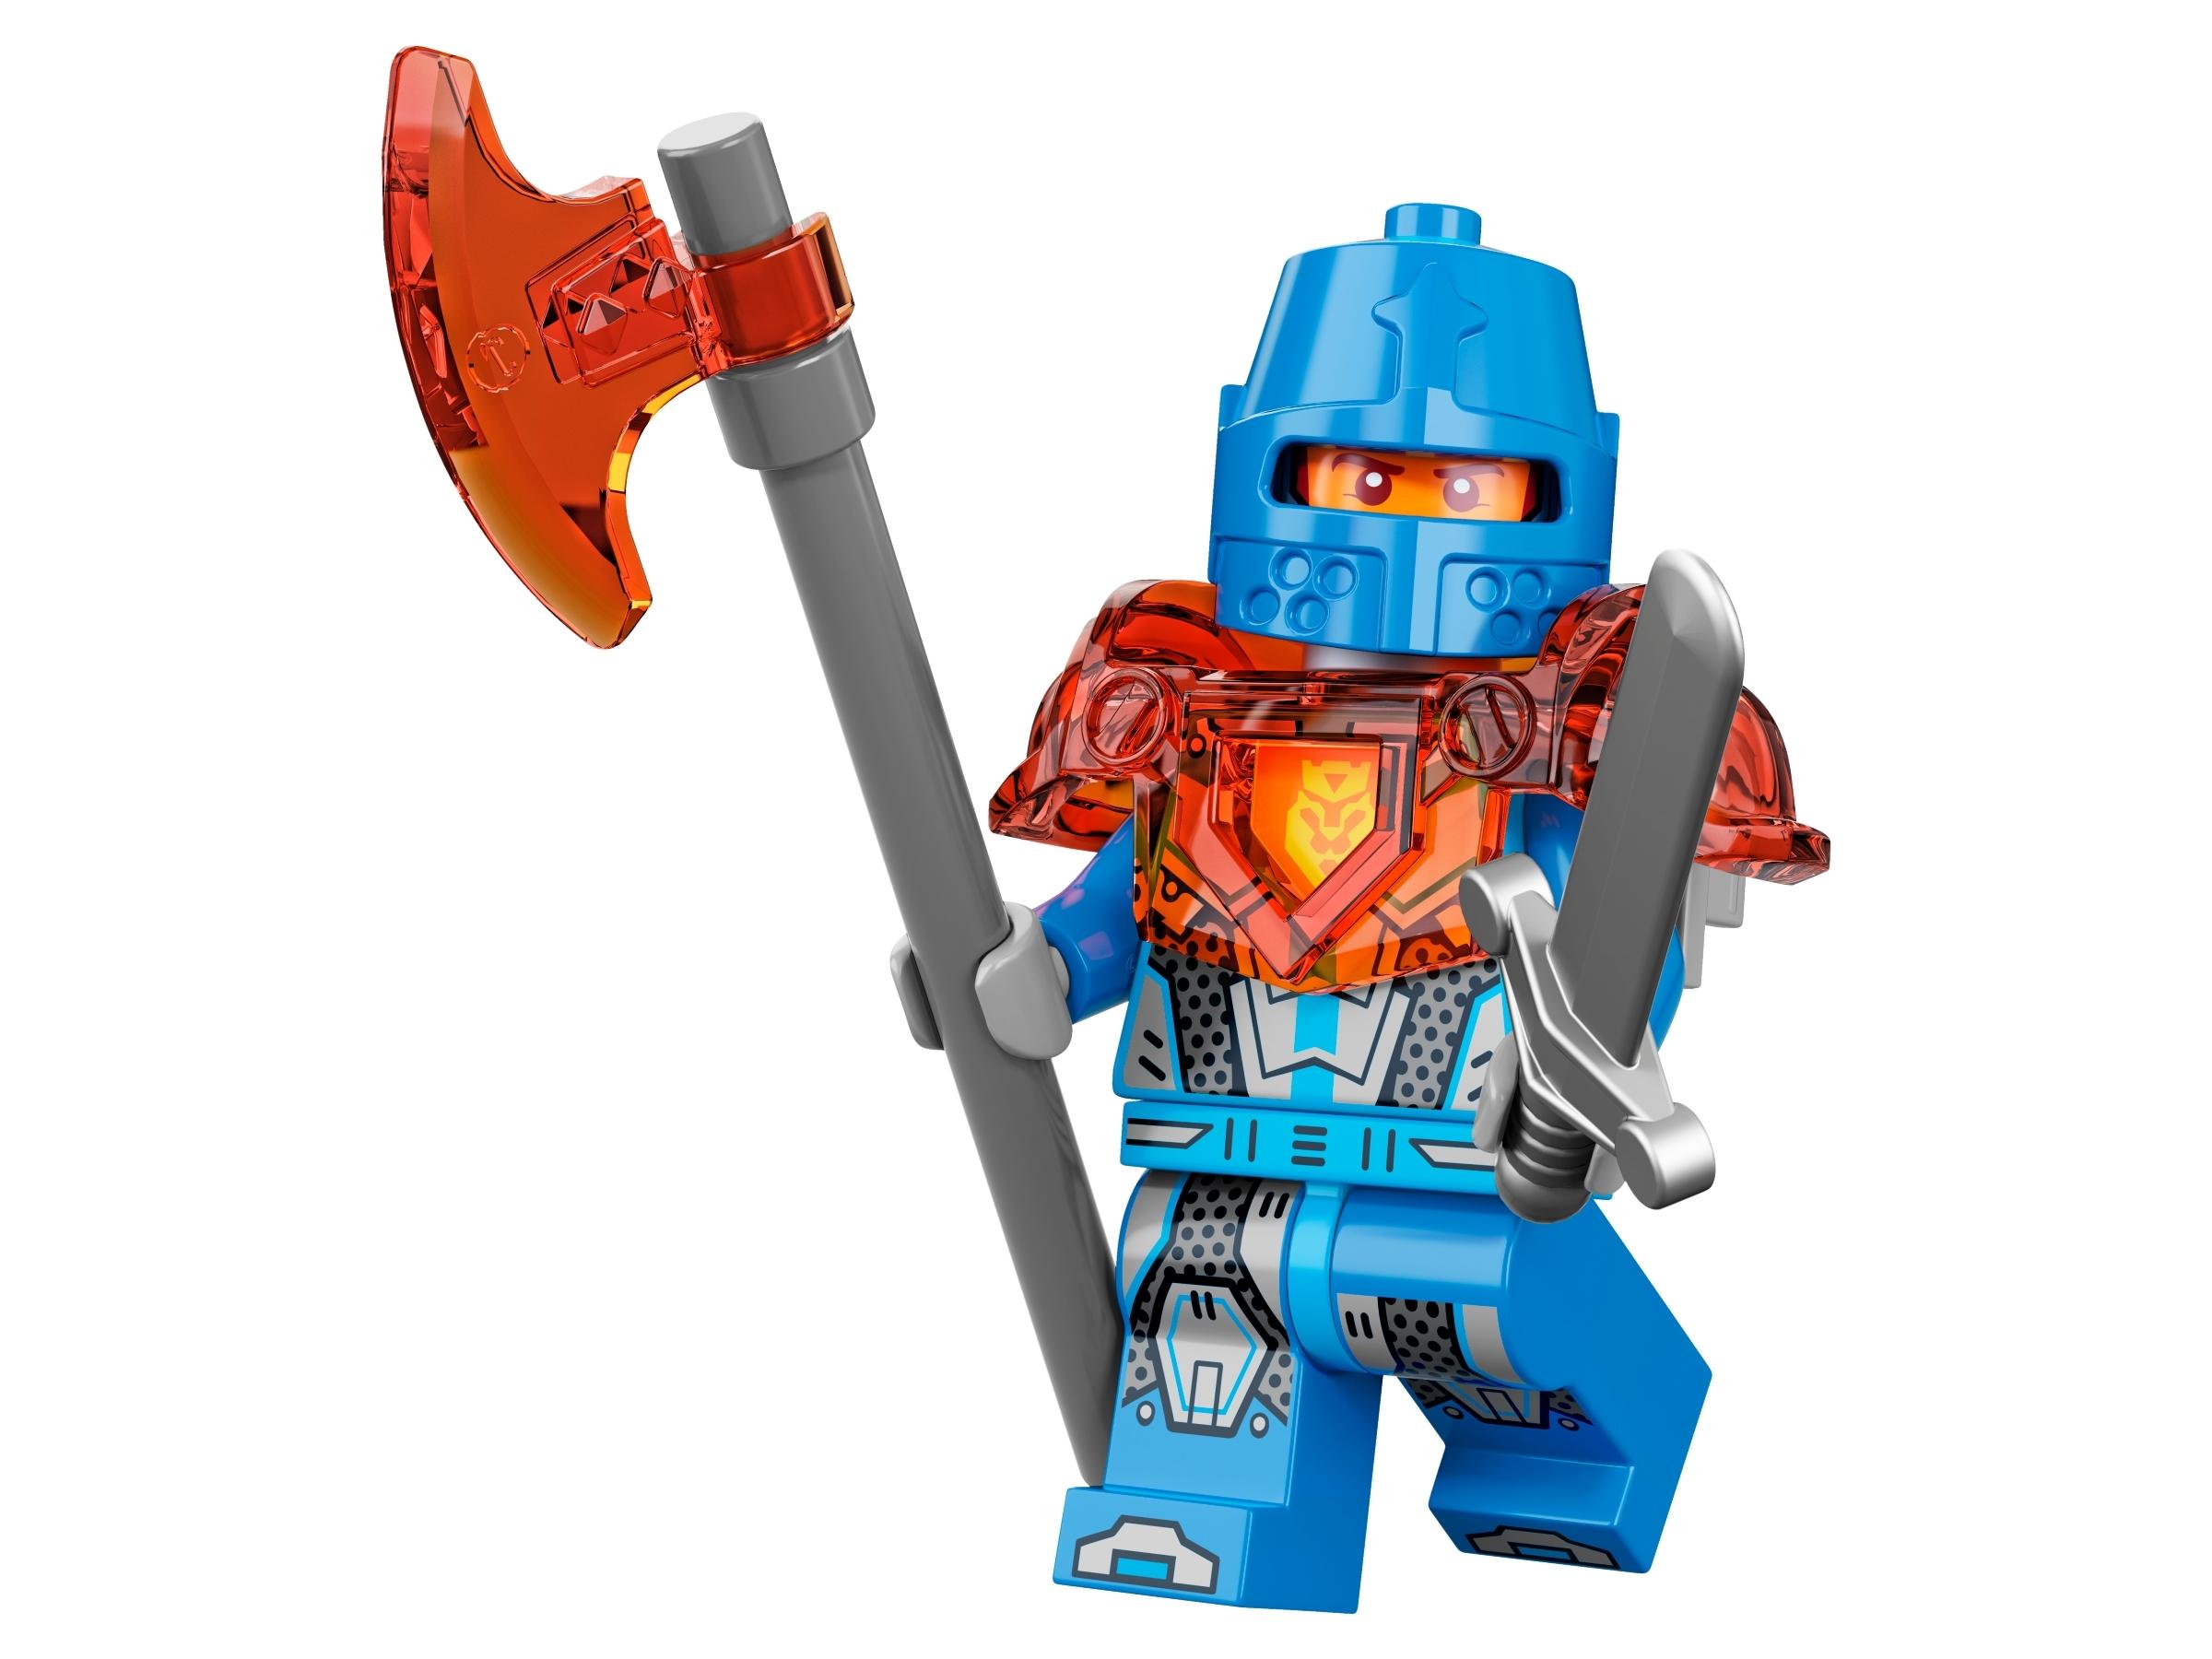 SHIPS WORLDWIDE LEGO 853676 Nexo Knights Minifigure Accessory Set NEW